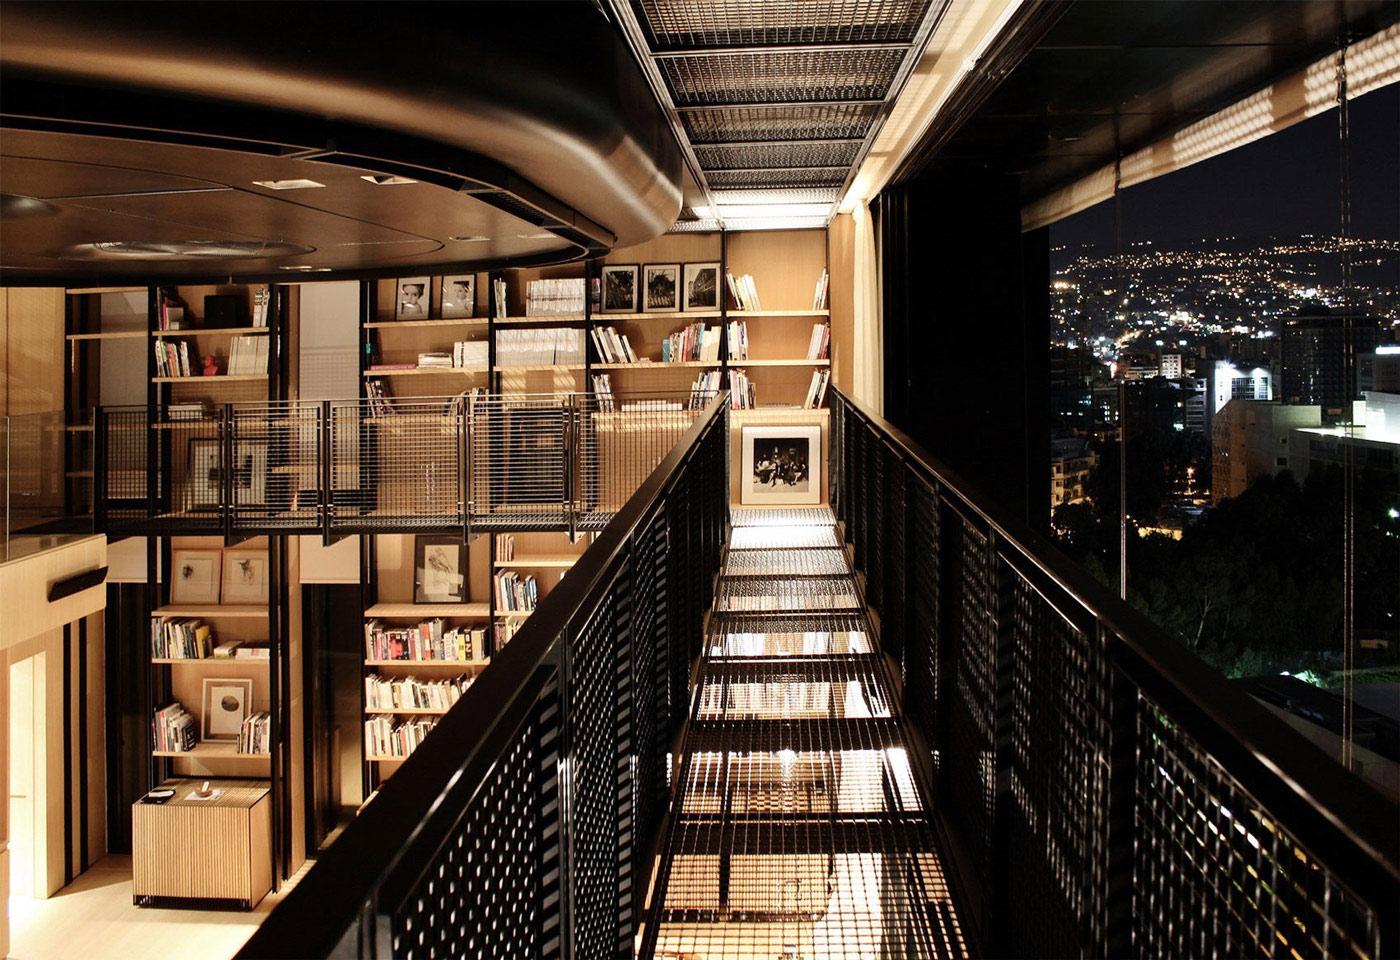 City Views, Book Shelves, Penthouse Apartment in Beirut, Lebanon